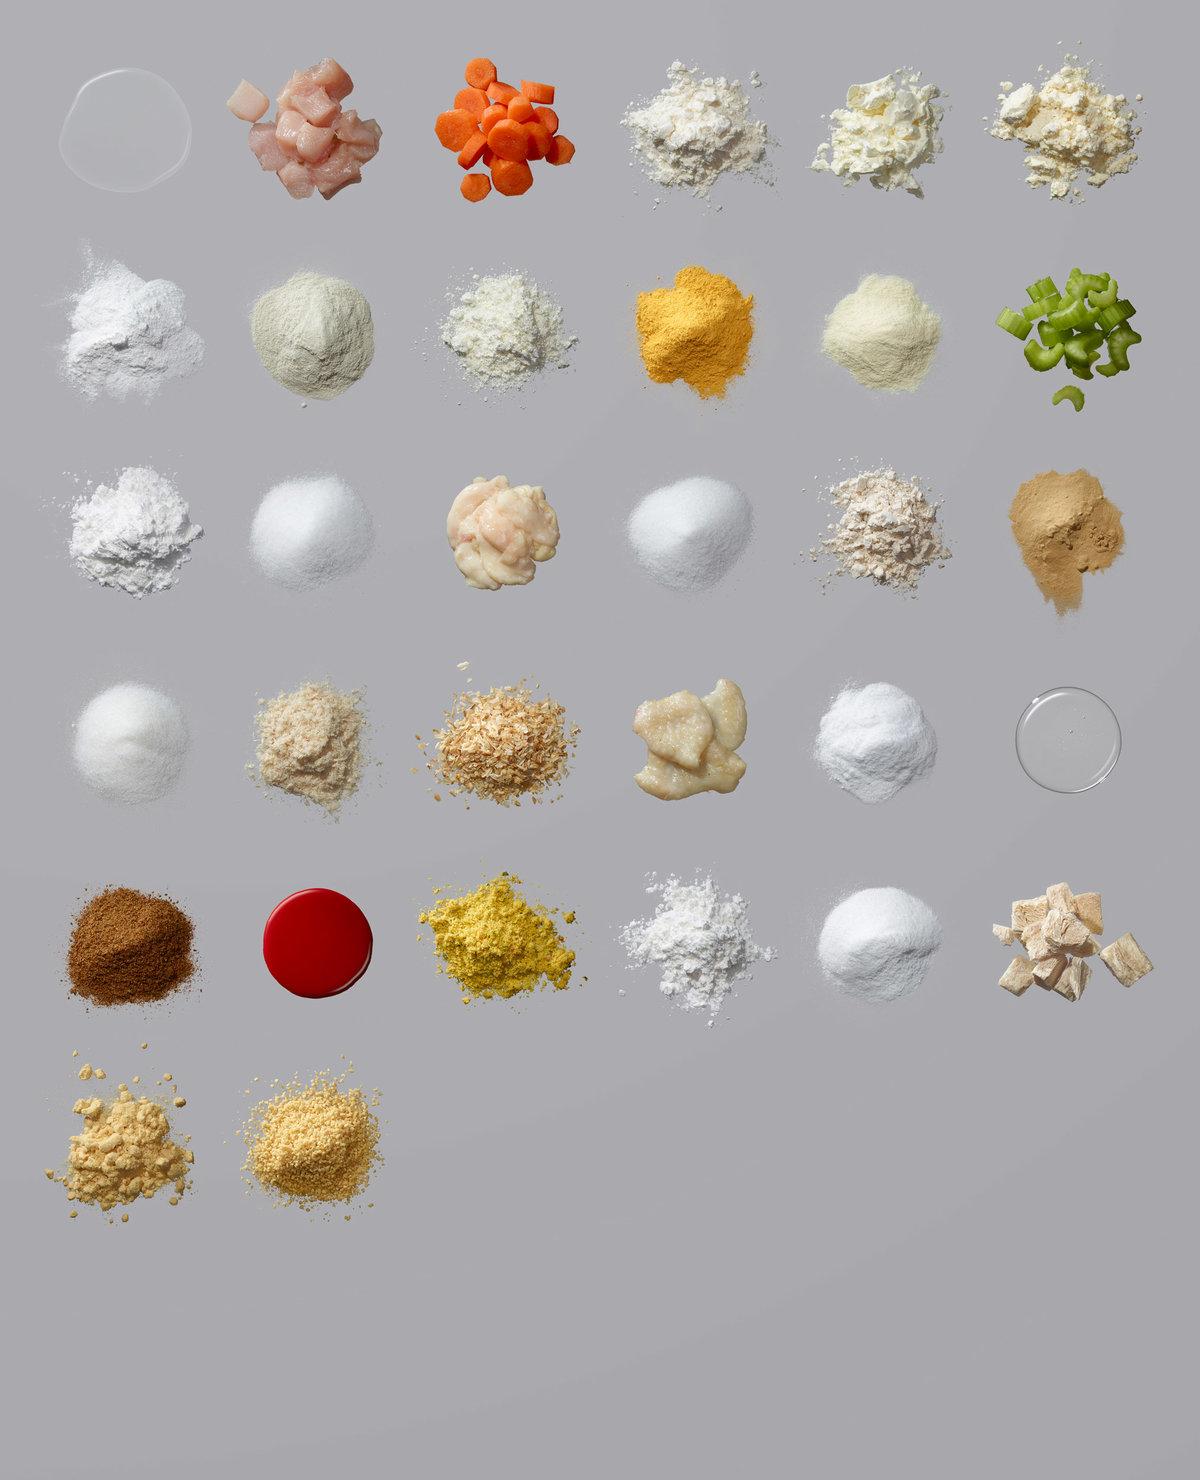 PageLines- rsz_ingredients_food_02_campbells_soup.jpg